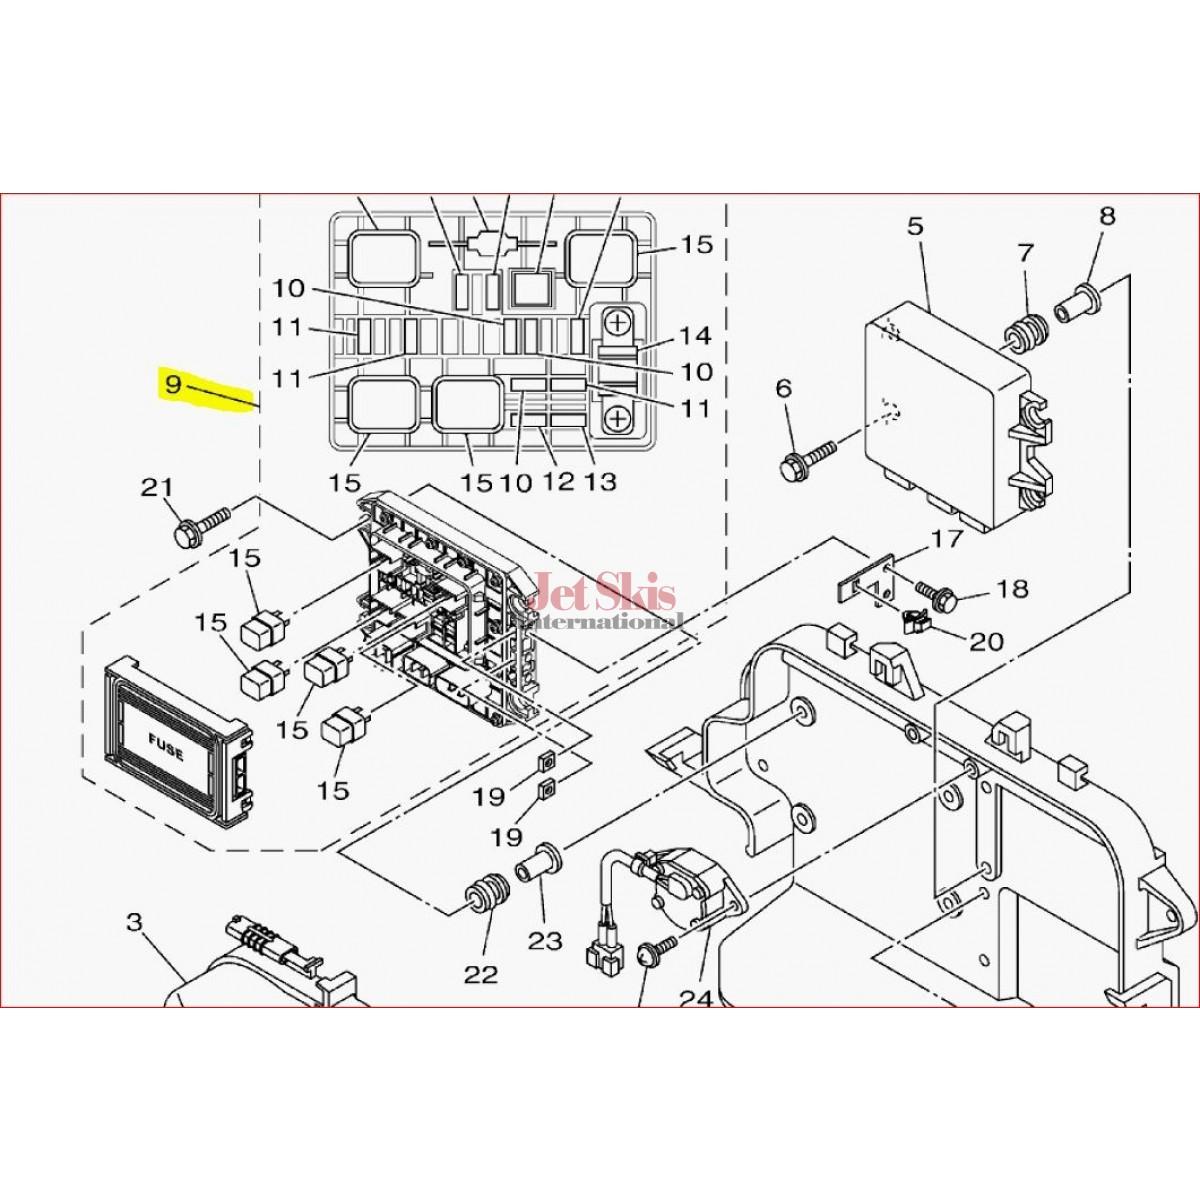 hight resolution of  1997 seadoo wiring diagram yamaha 6ex 82170 01 00 fuse box assembly